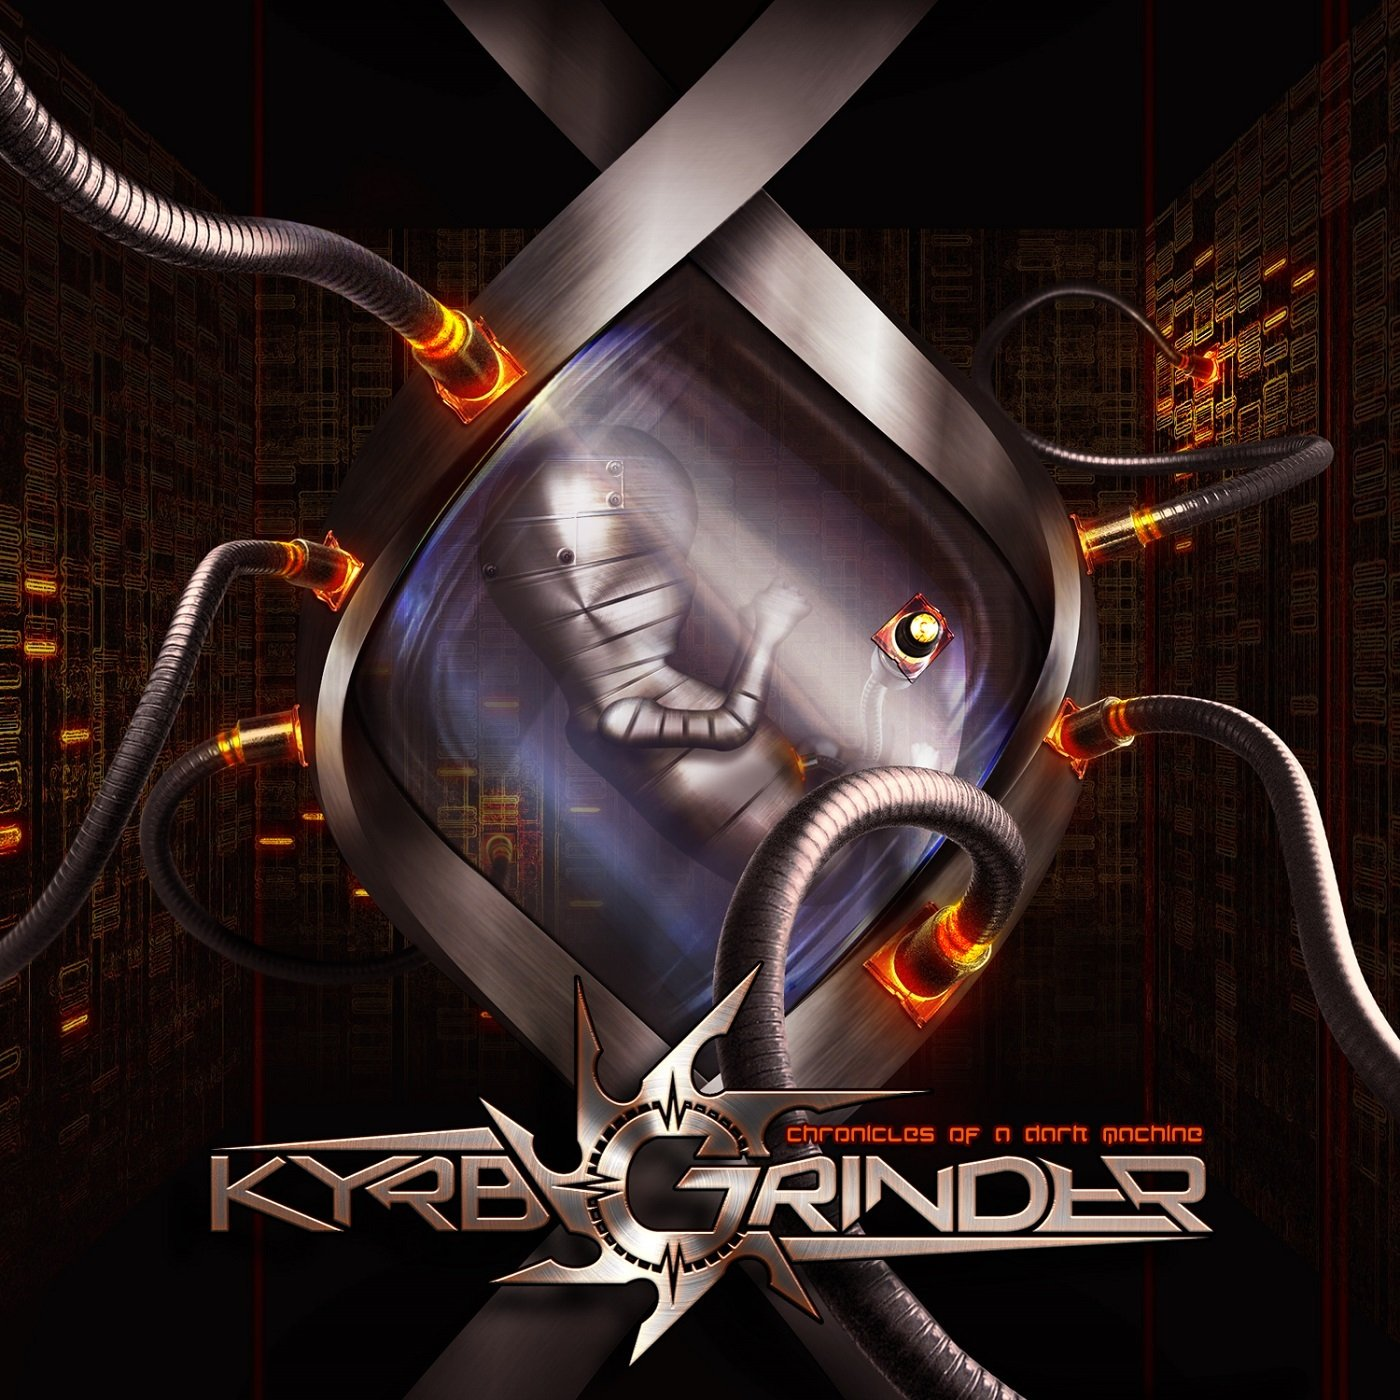 KYRBGRINDER Chronicles Of A Dark Machine